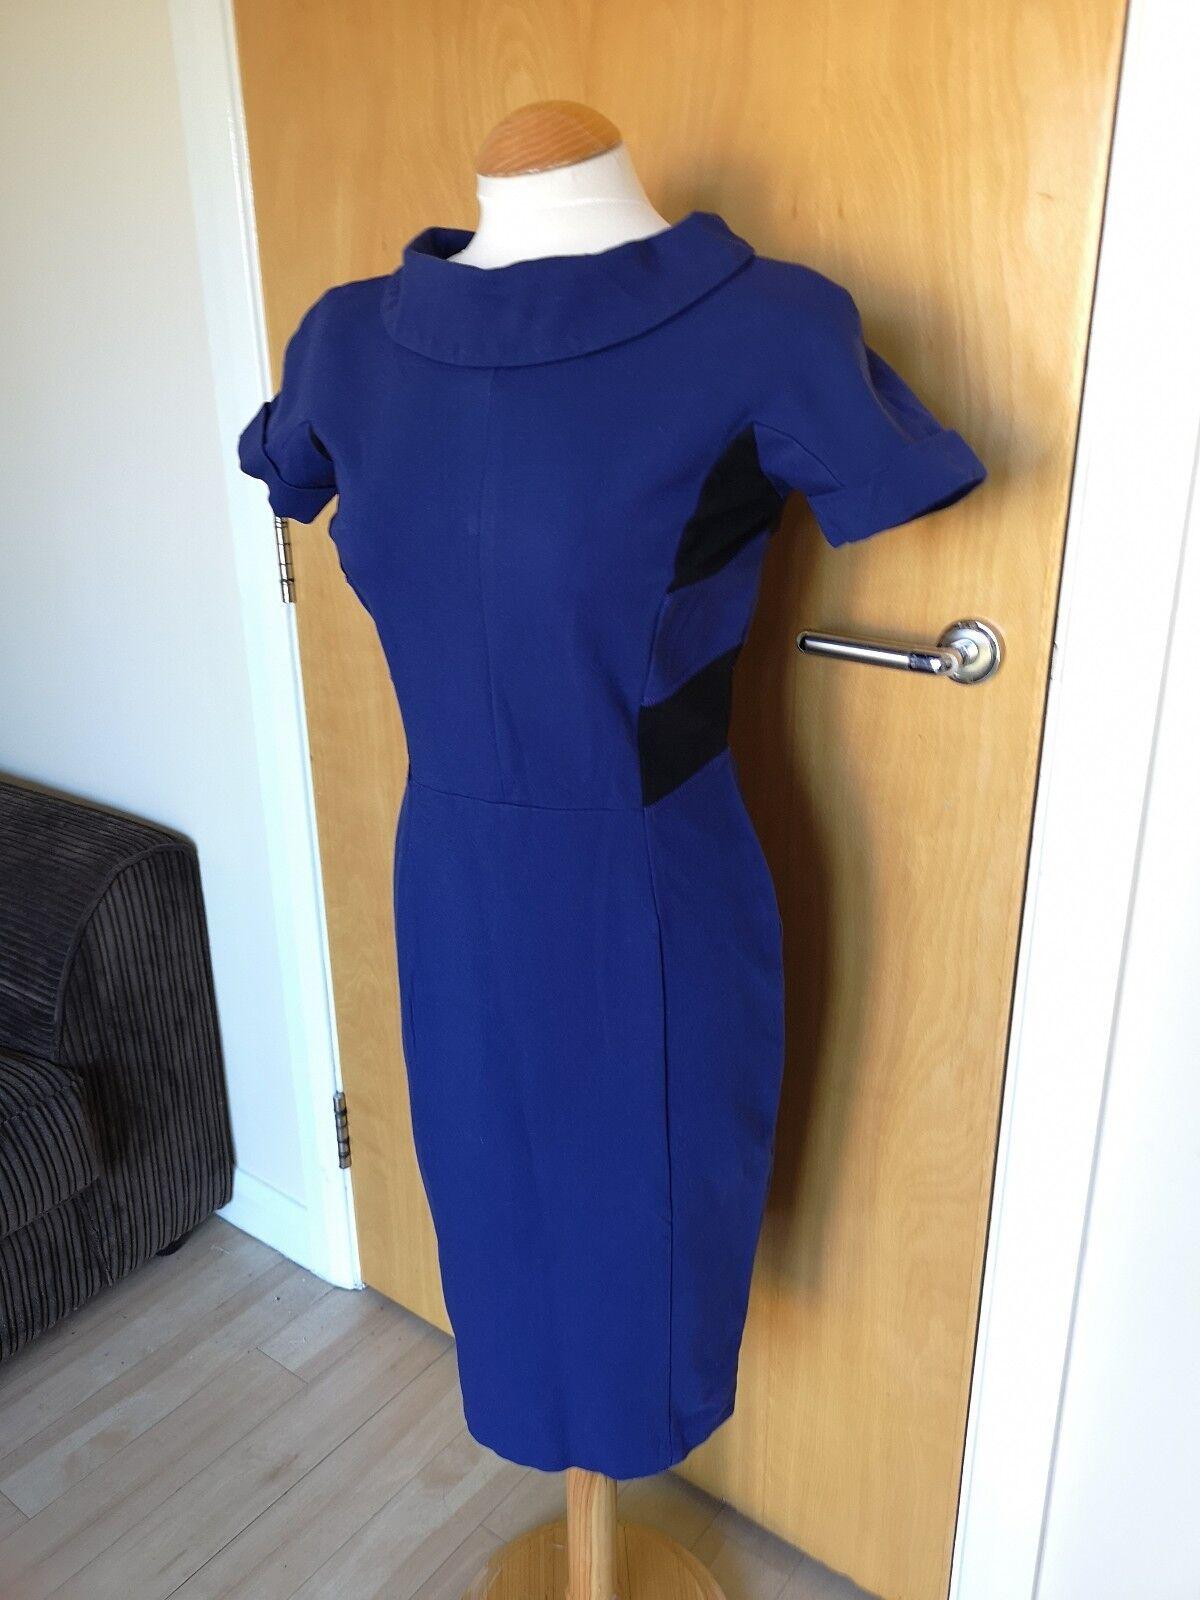 Ladies MARC CAIN Dress Größe N2 10 UK Blau schwarz Shift Wiggle Pencil Smart Office